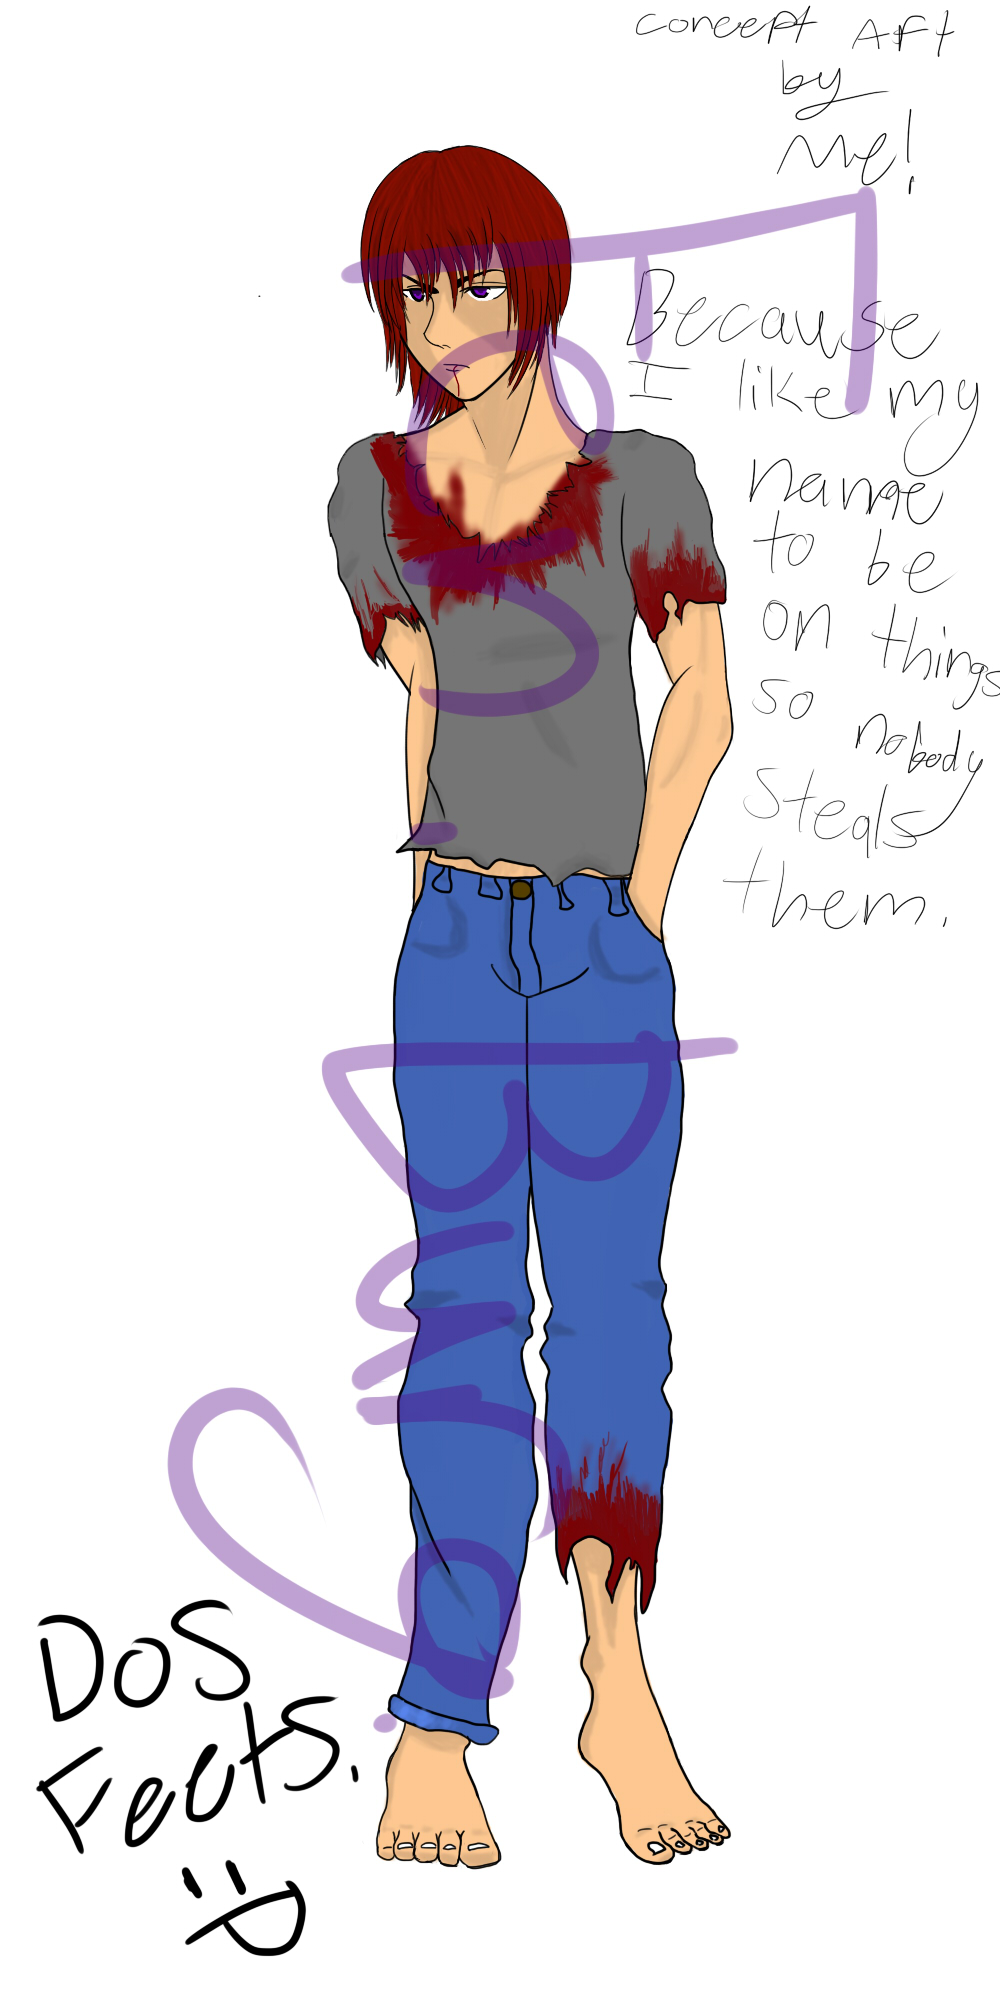 Character Concept Art #1